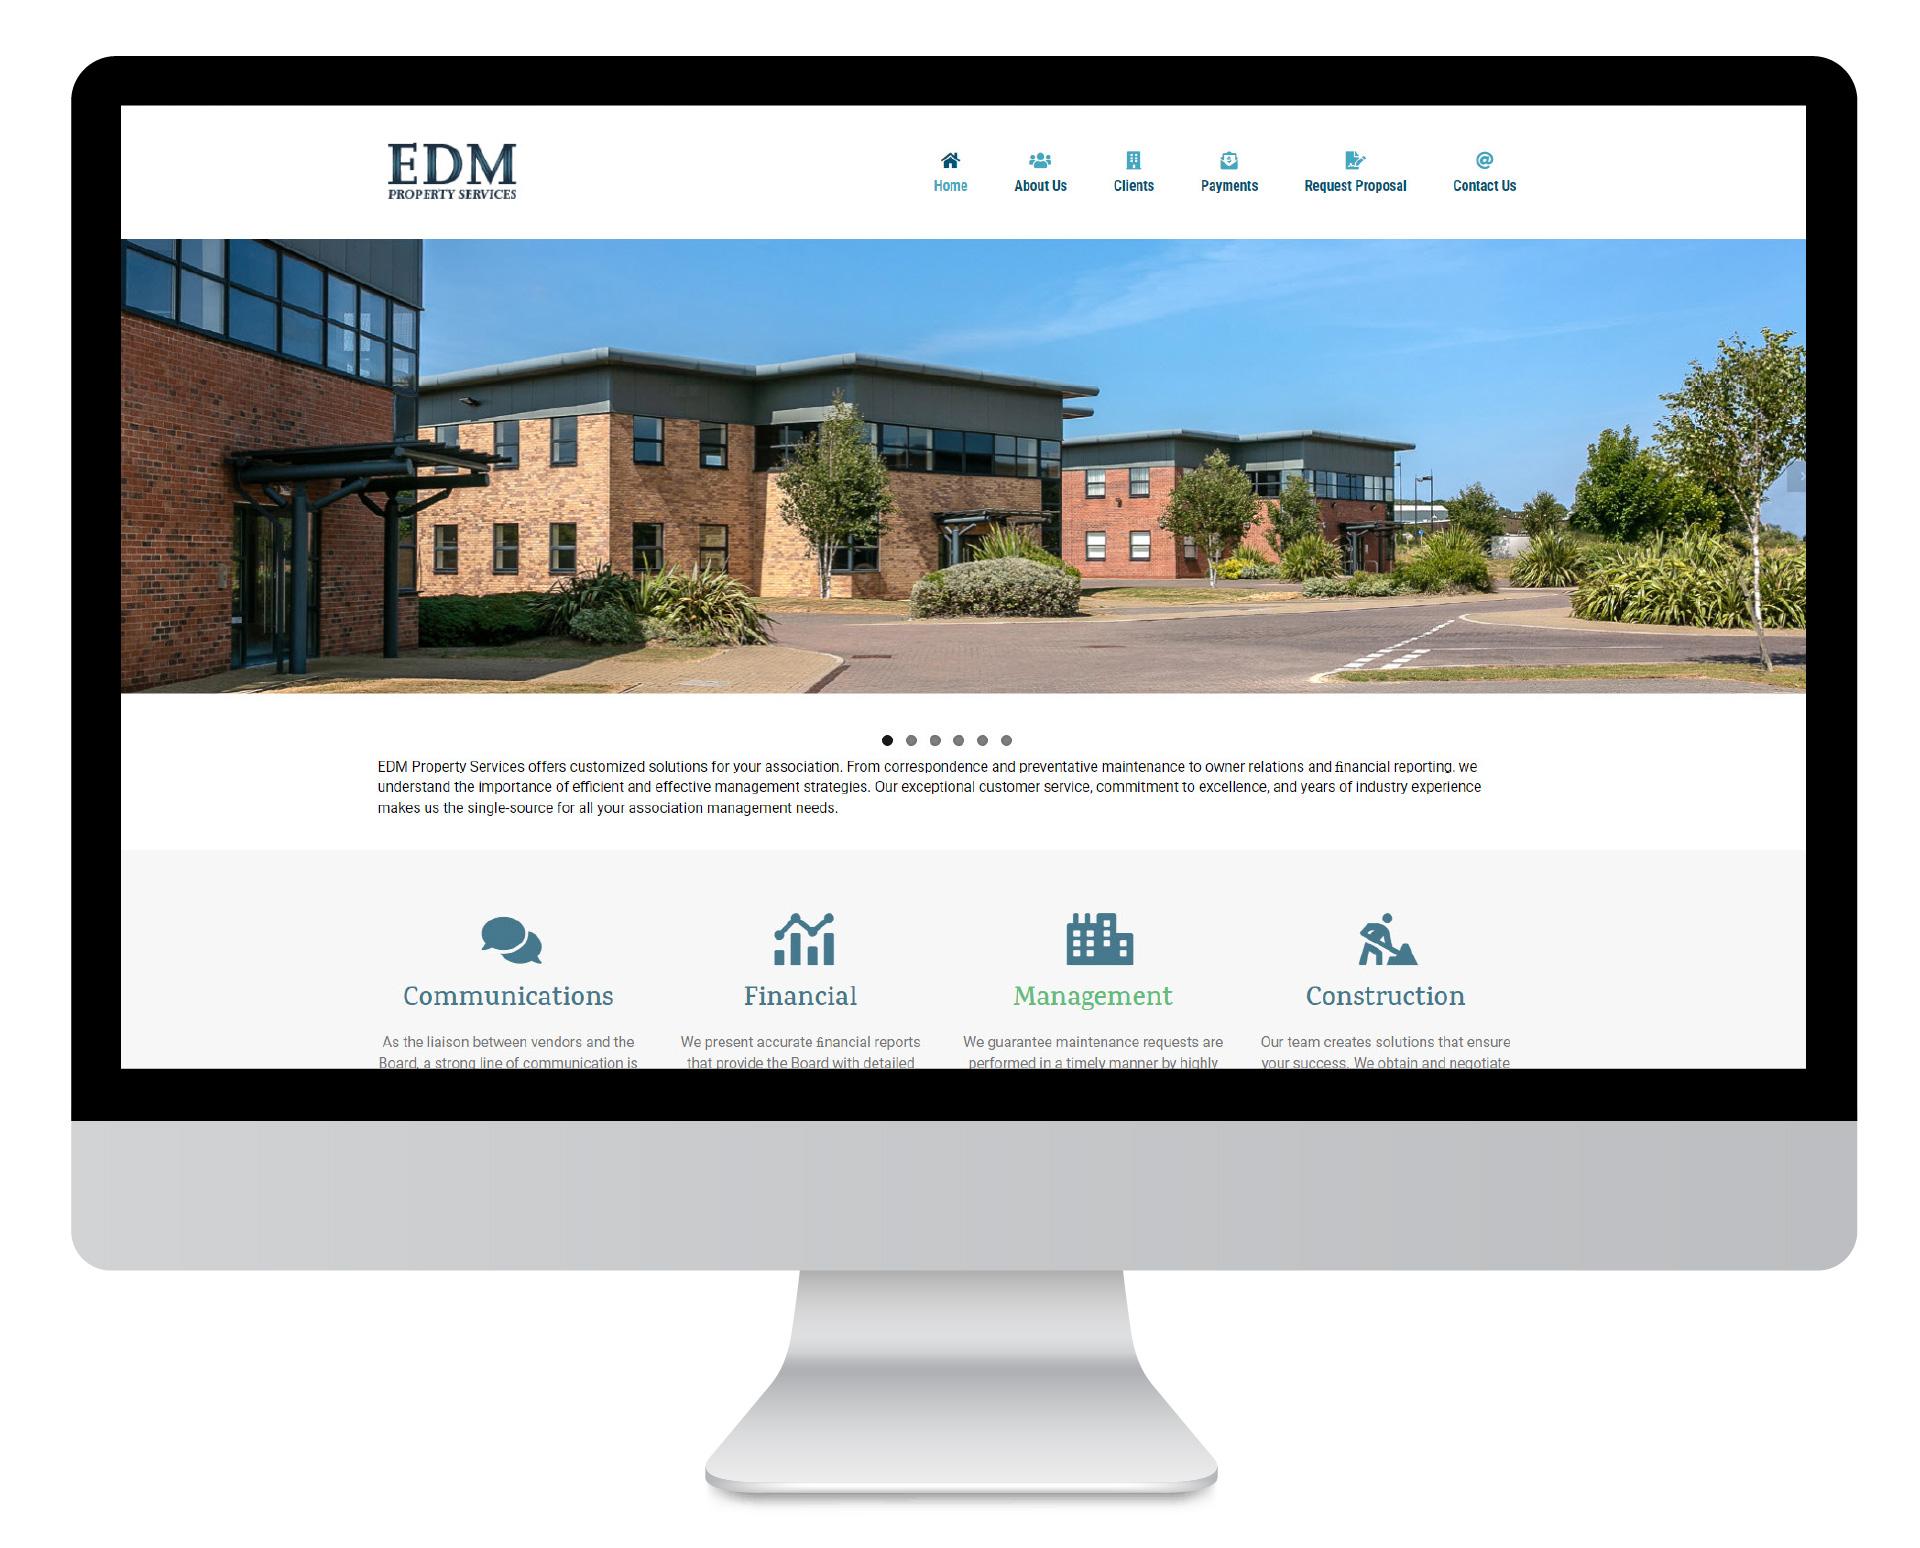 EDM Property Services